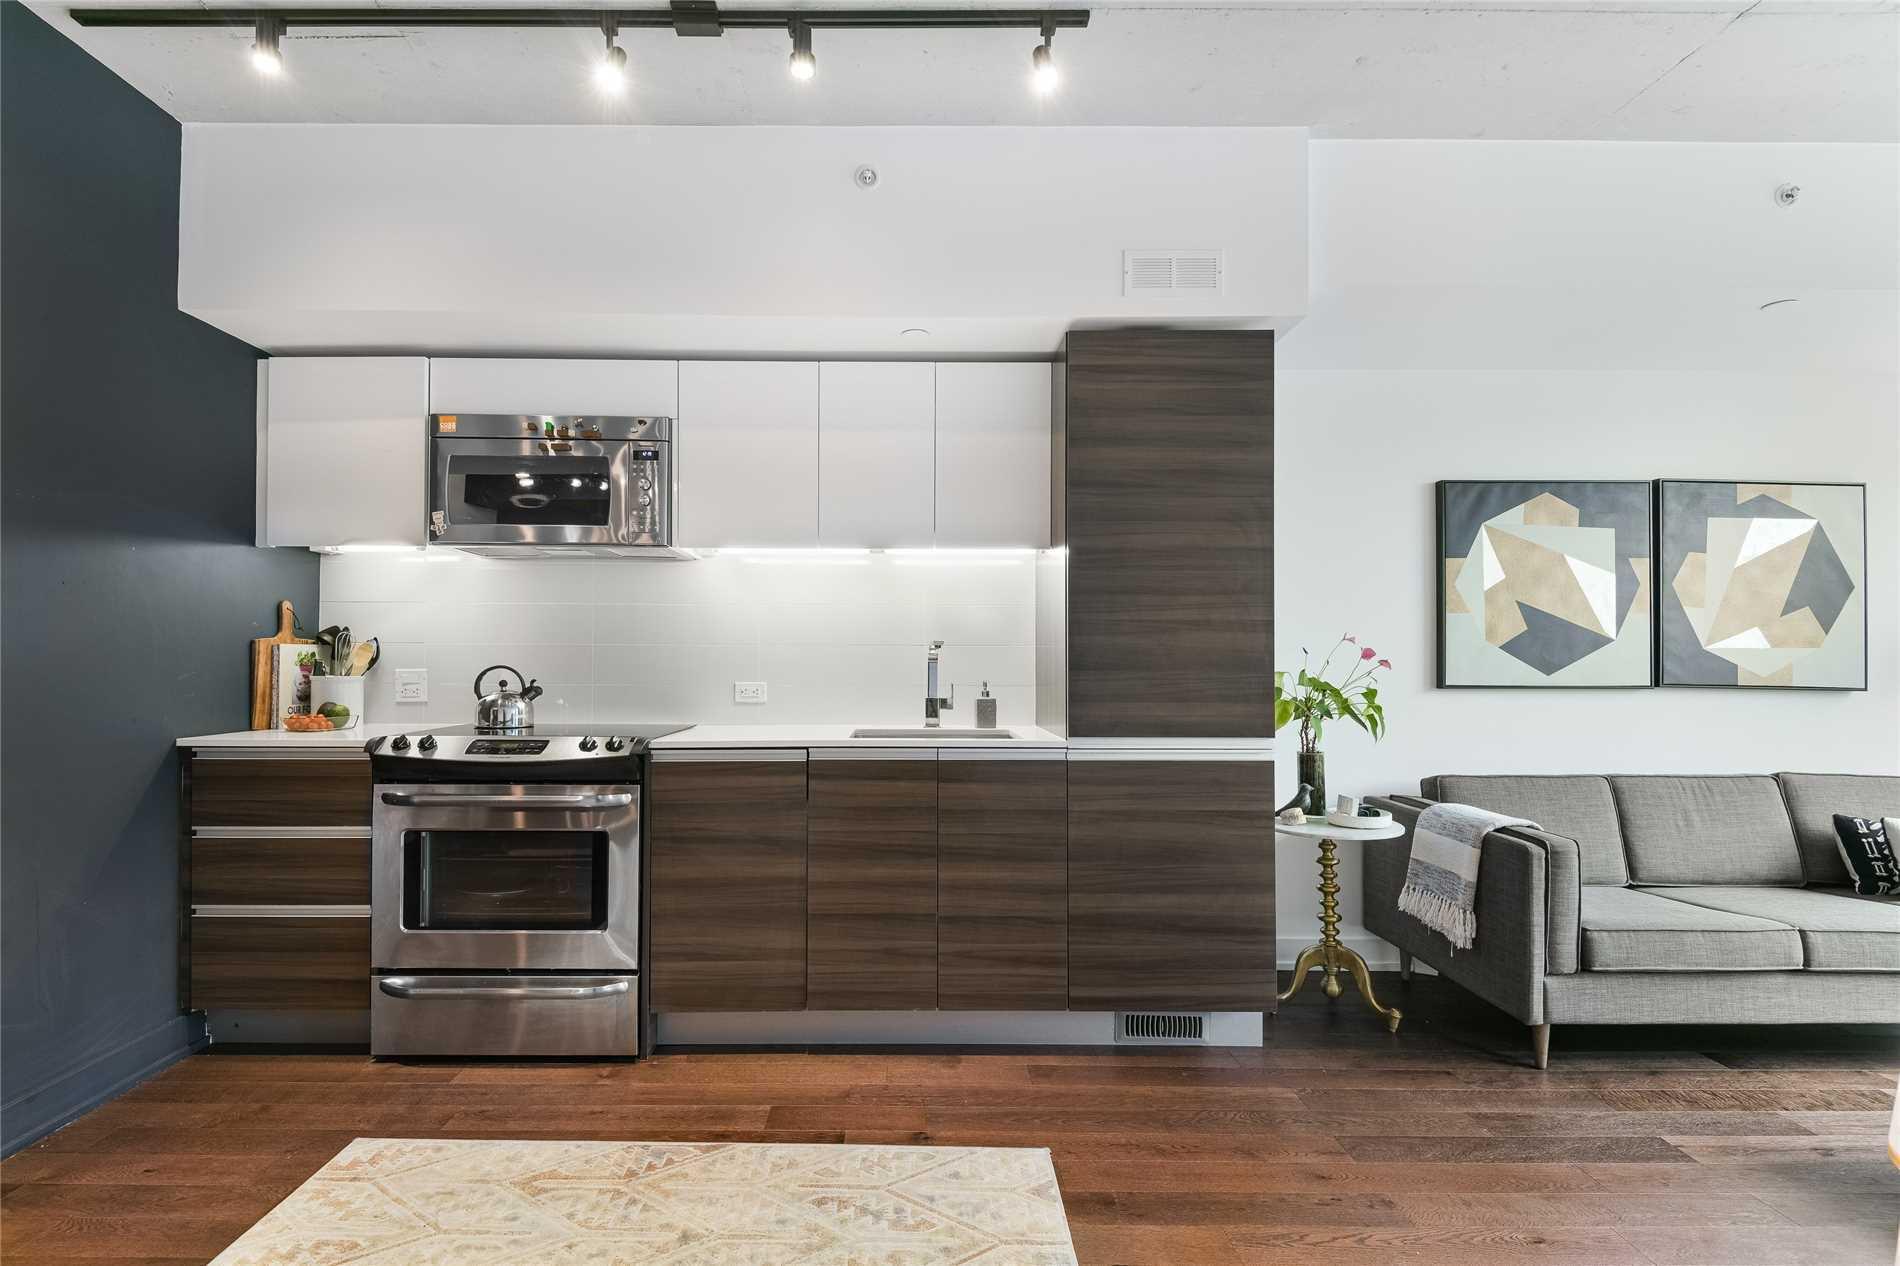 Main Photo: 910 1190 E Dundas Street in Toronto: South Riverdale Condo for sale (Toronto E01)  : MLS®# E4496416